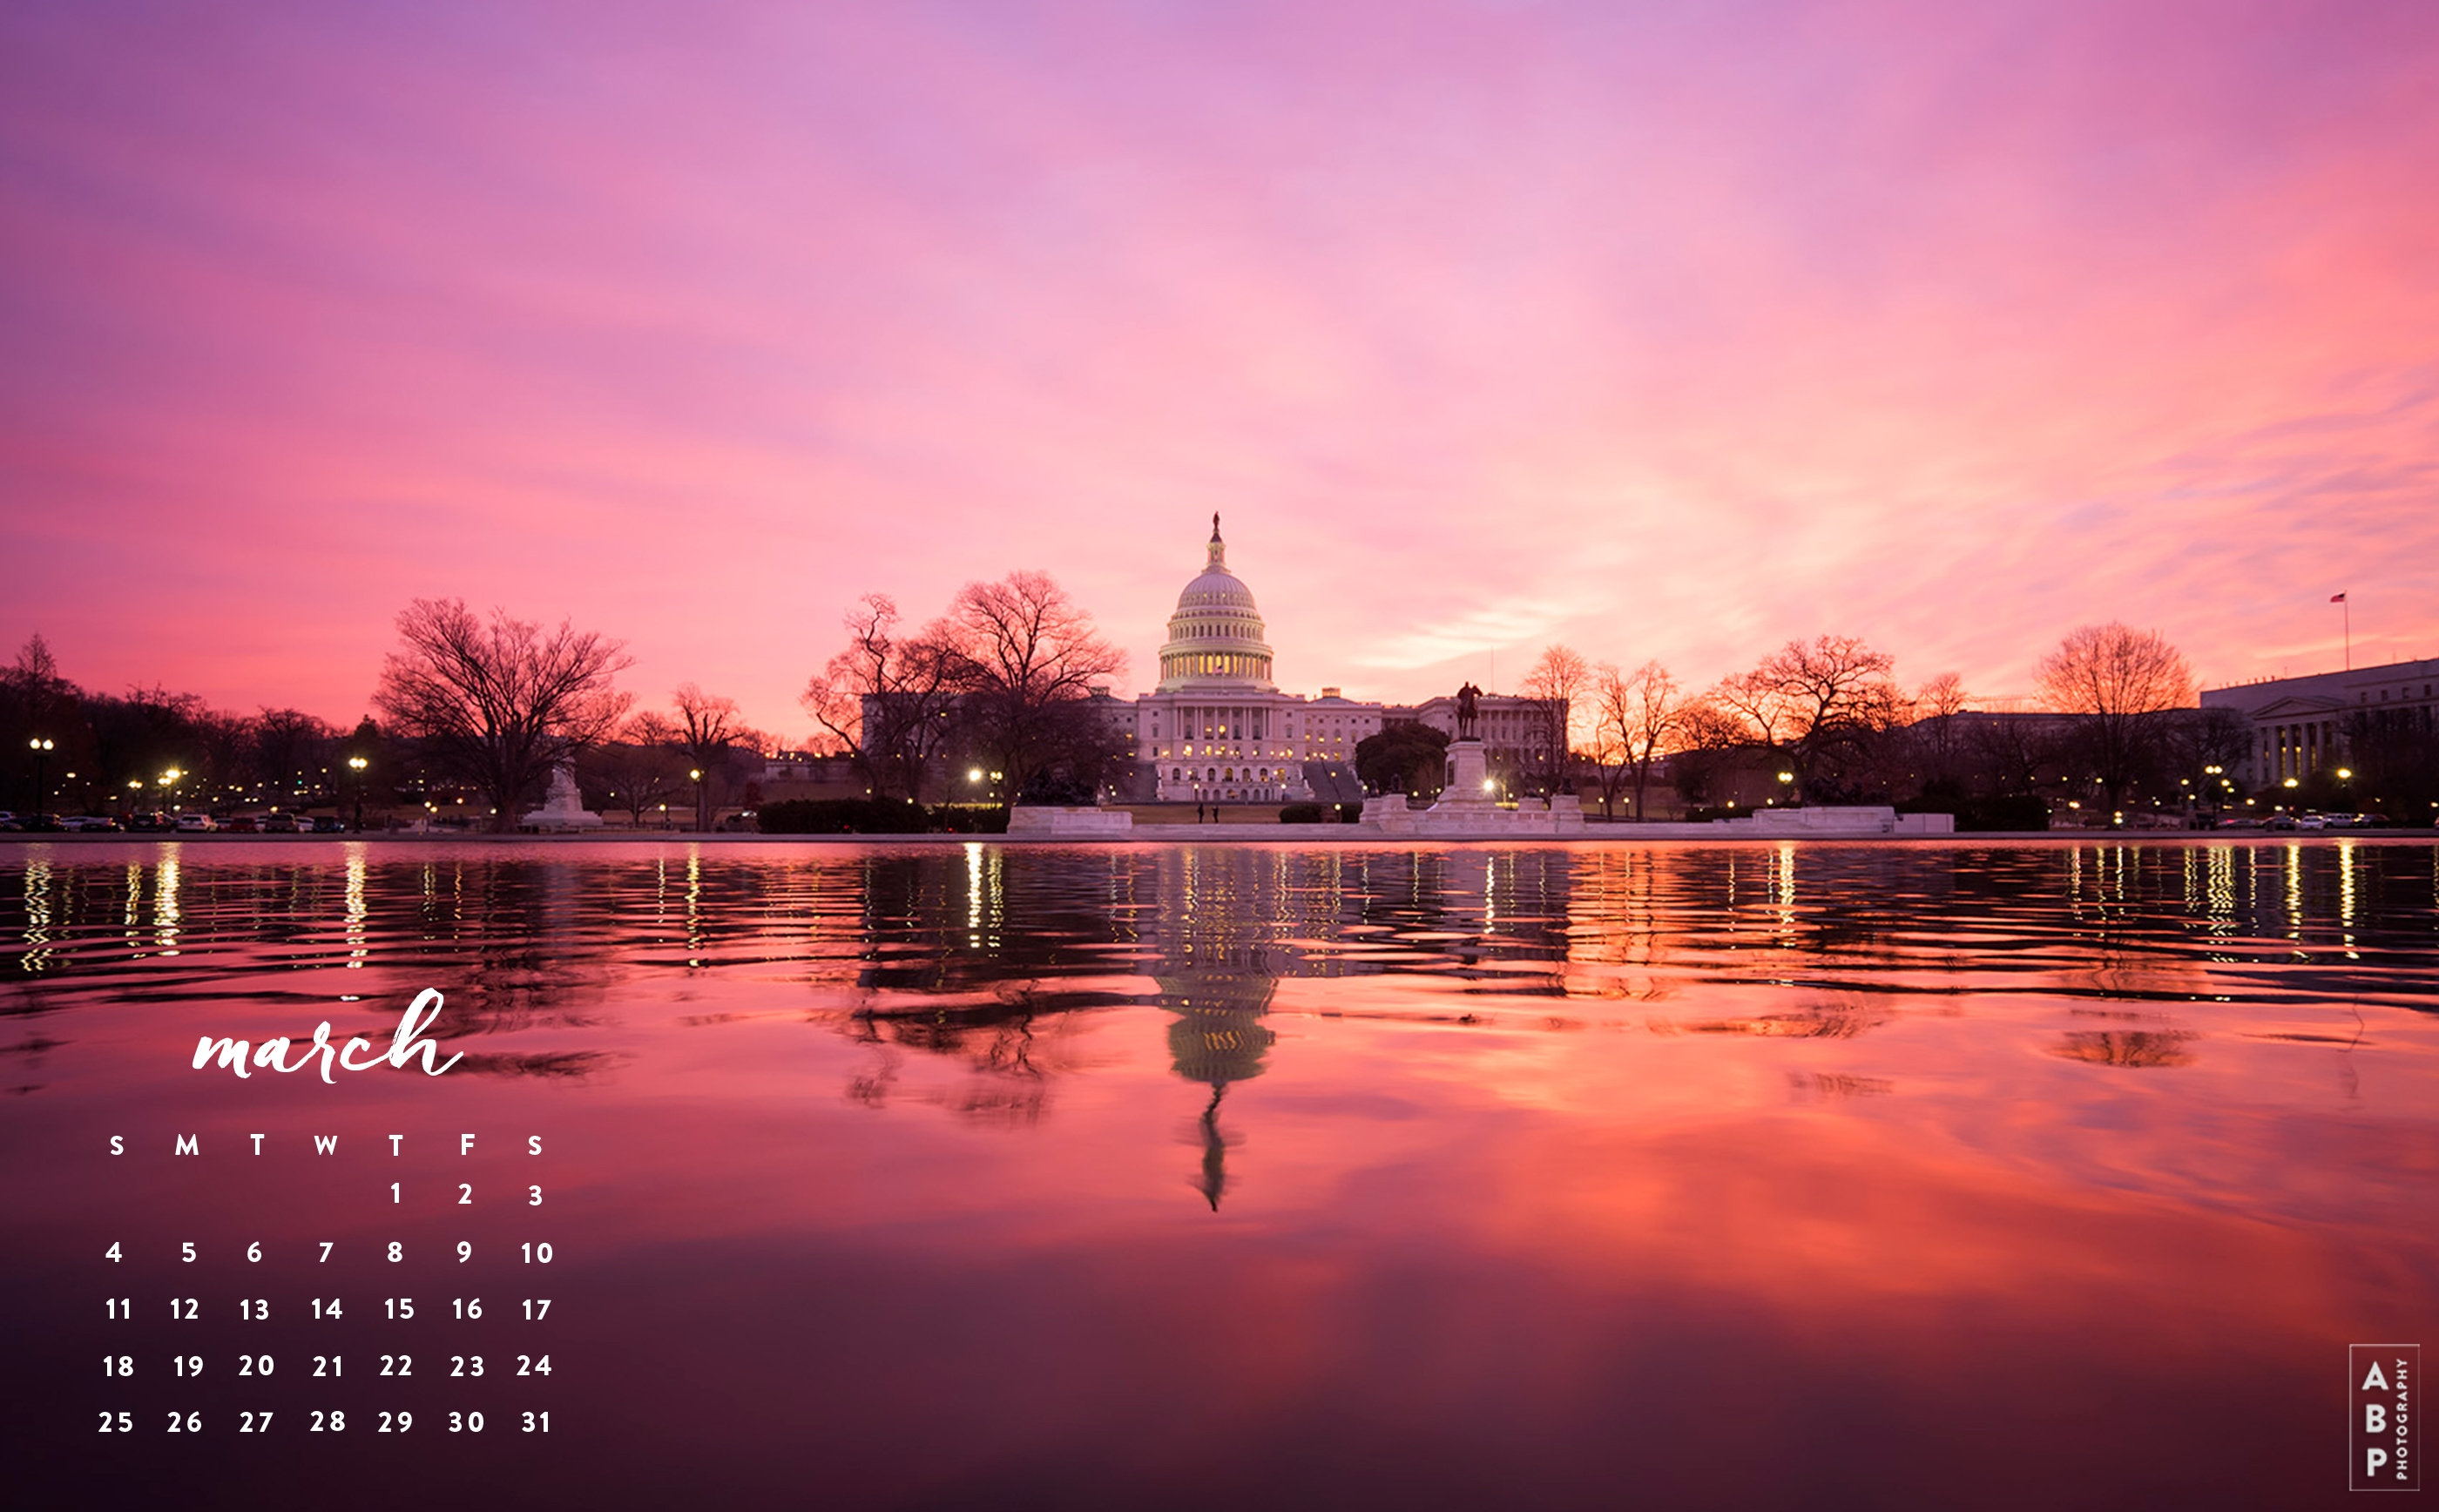 March 2018 wallpaper downloads - March desktop wallpaper ...